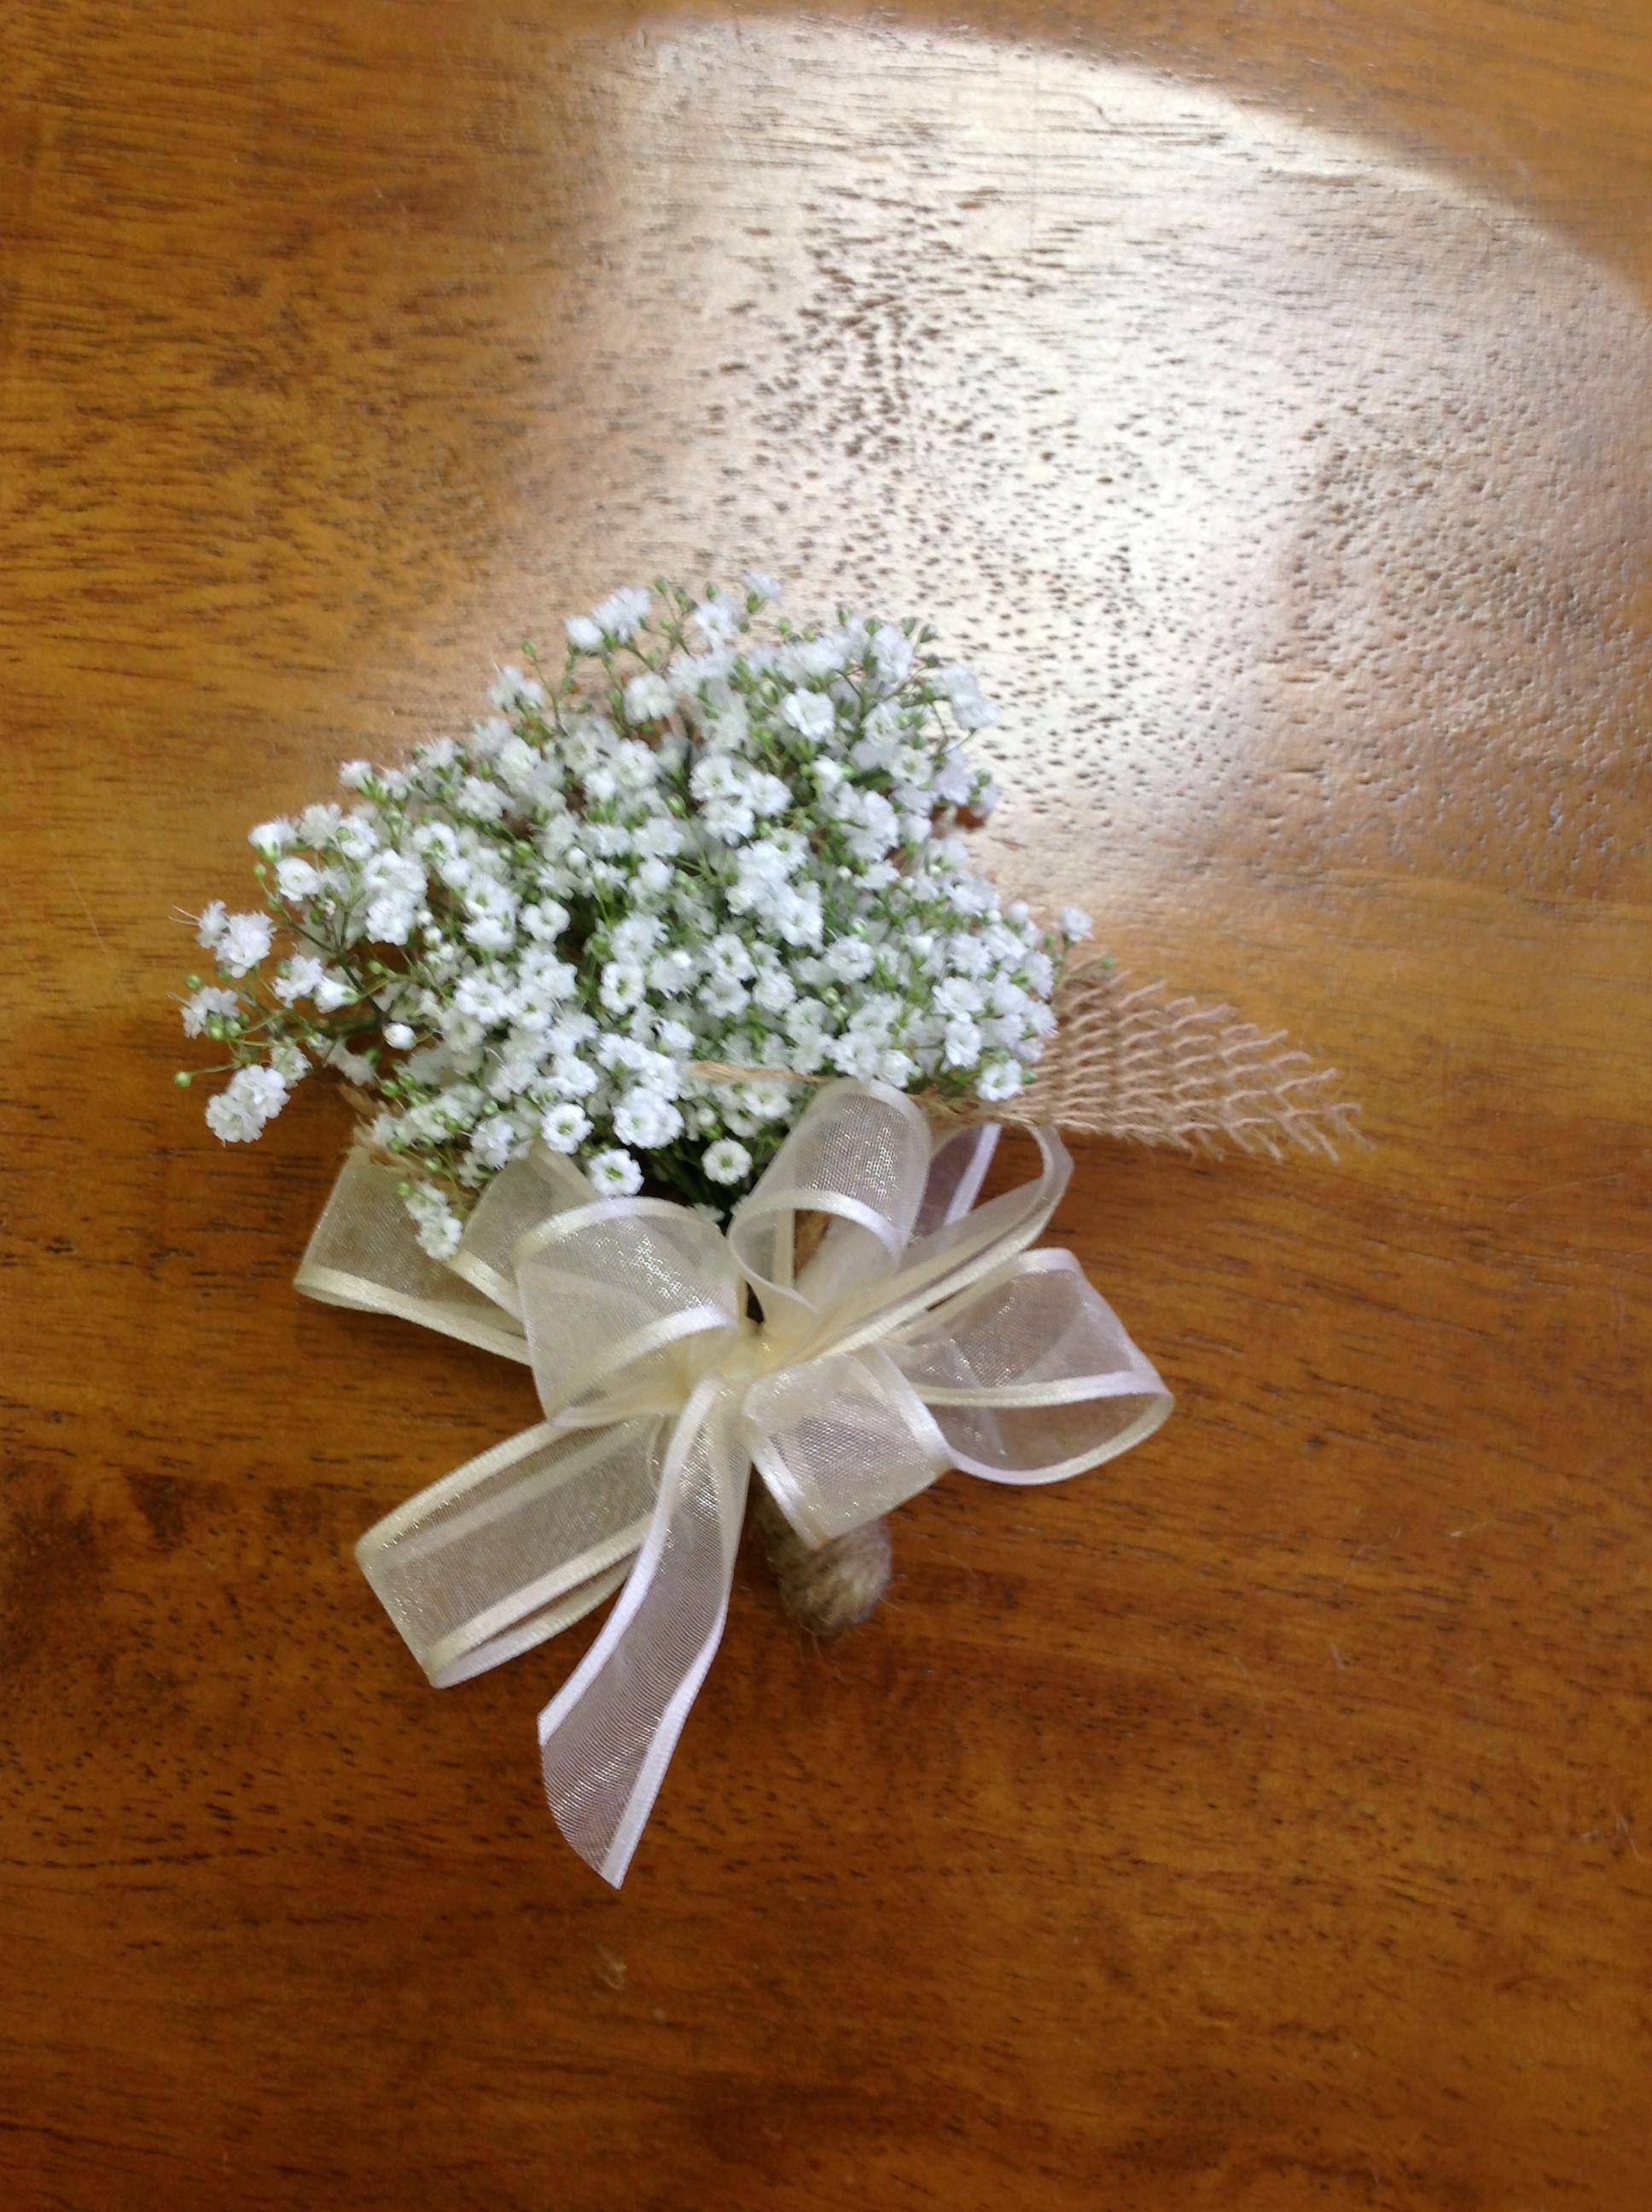 Simple babies breath corsage garden wedding | June Wedding ...